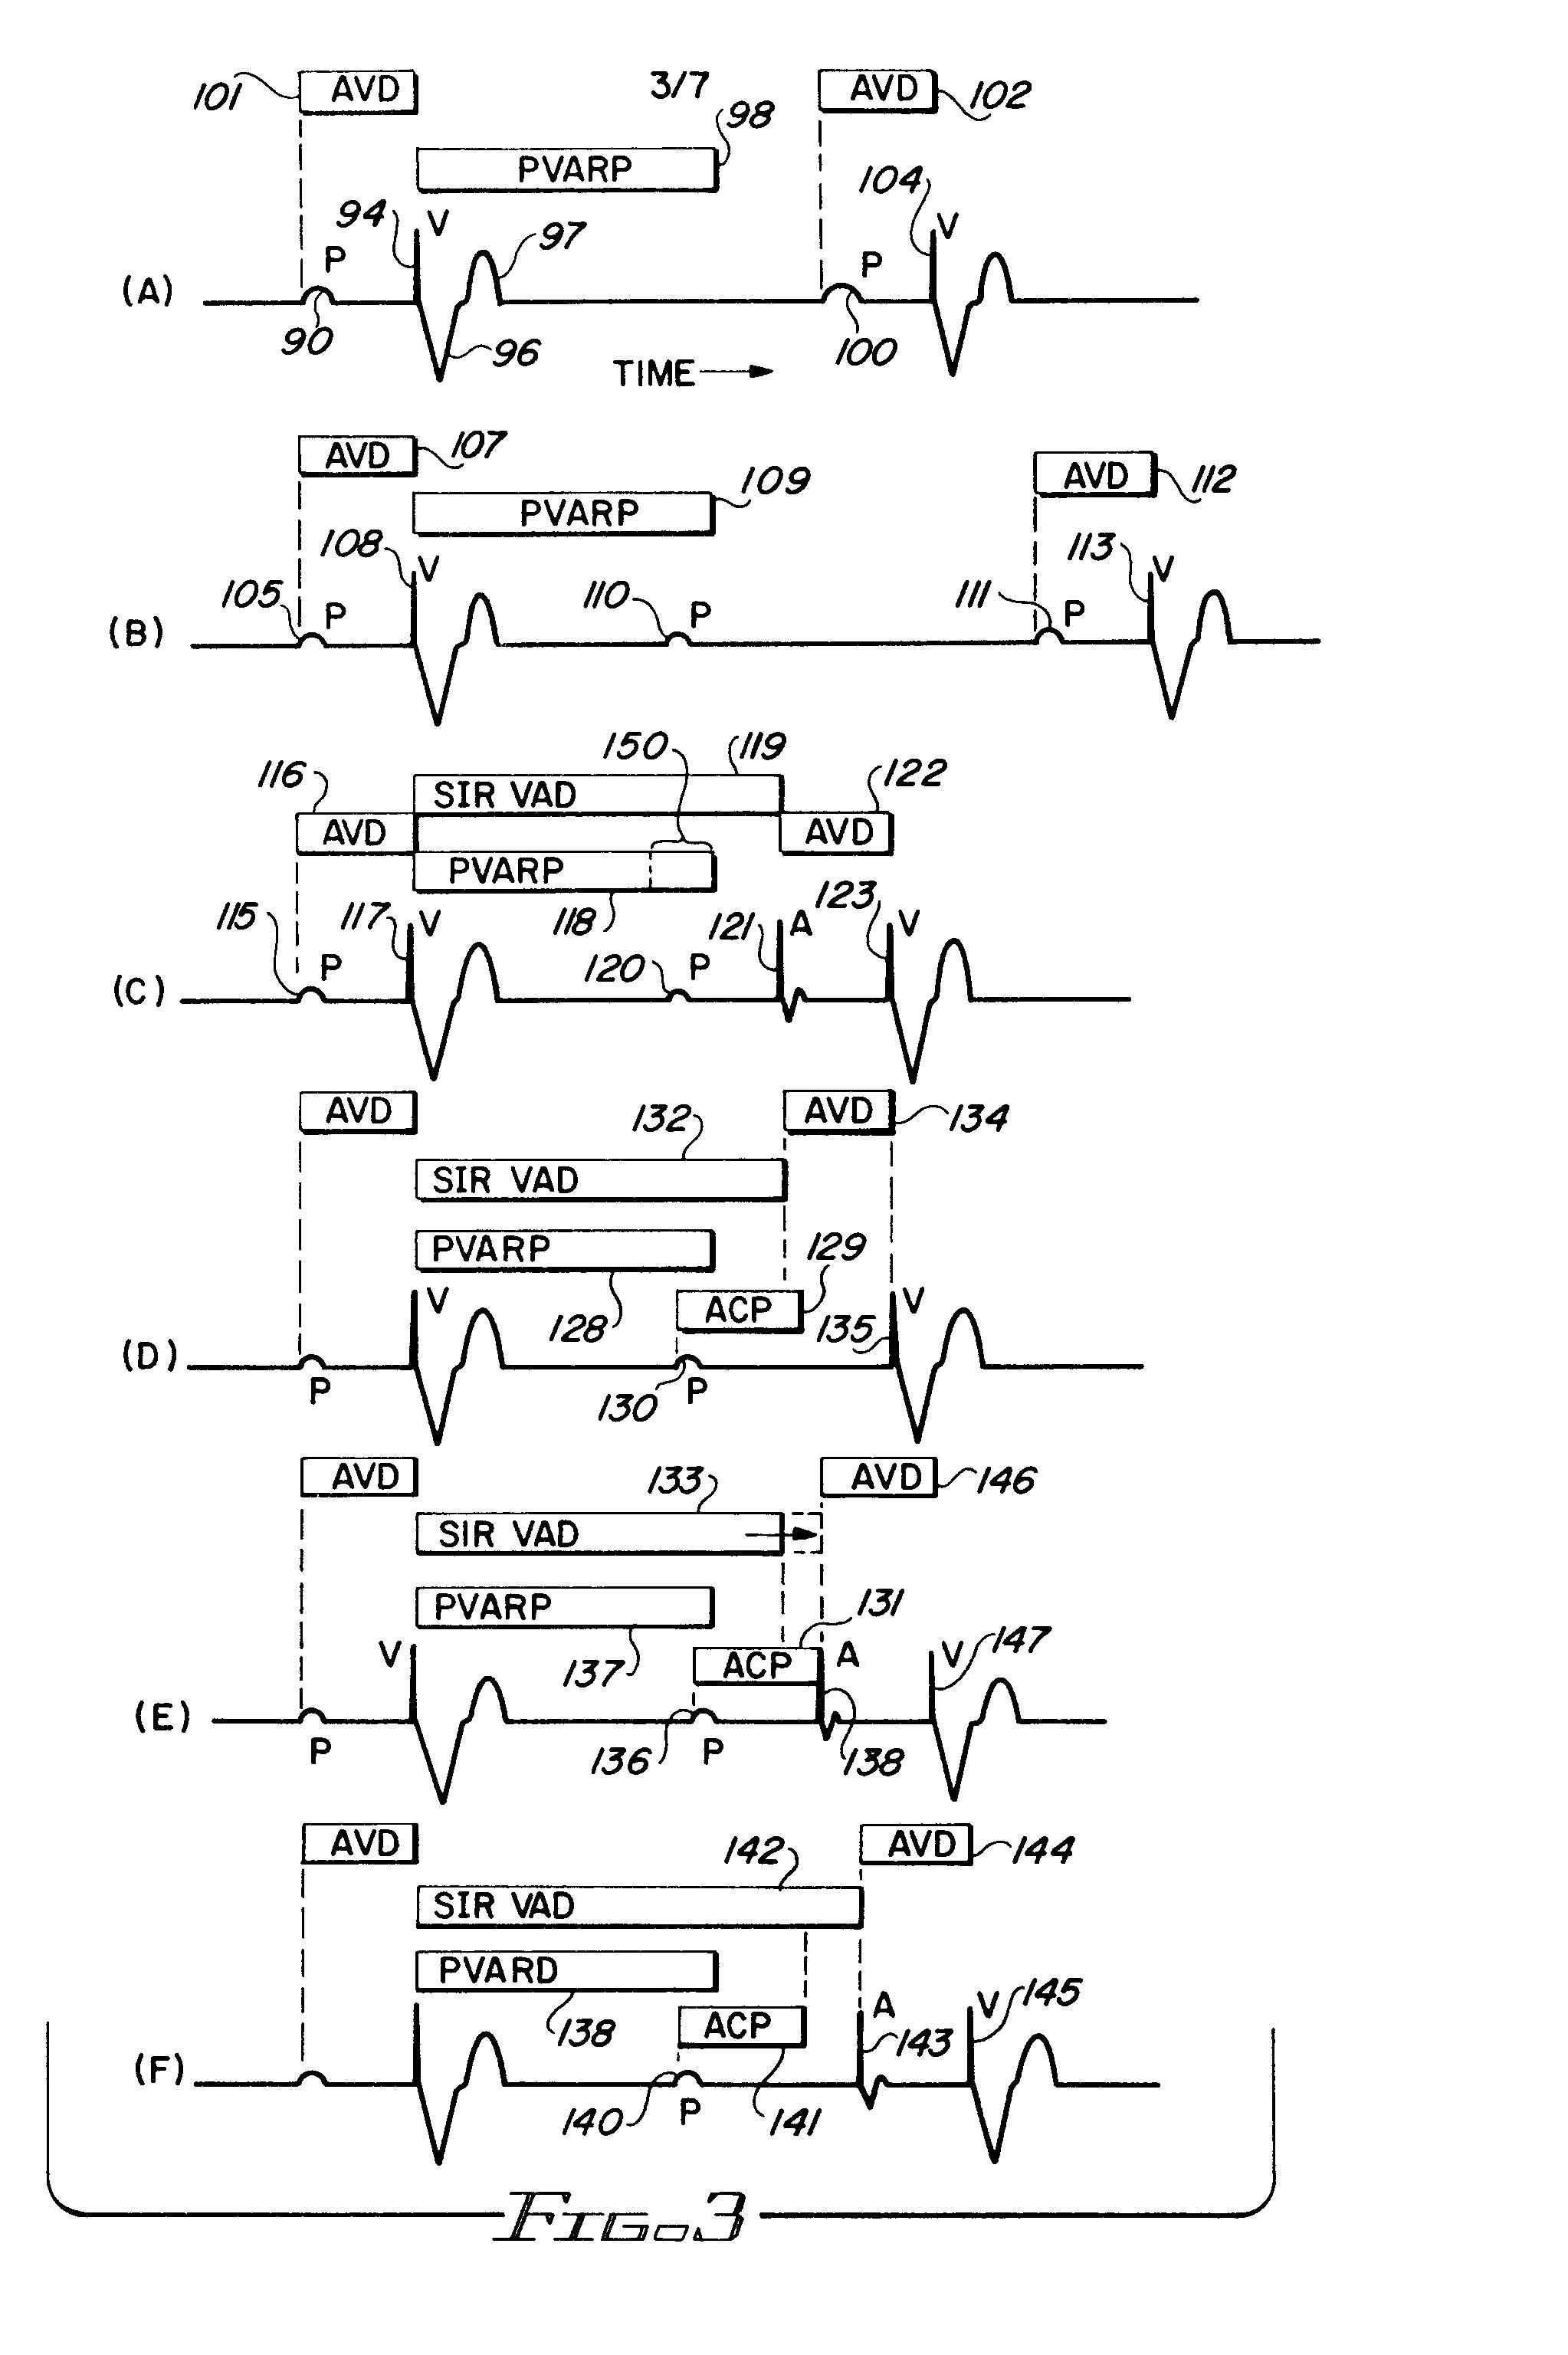 ... Blank Heart Diagram , Blank Digestive System Diagram , Blank